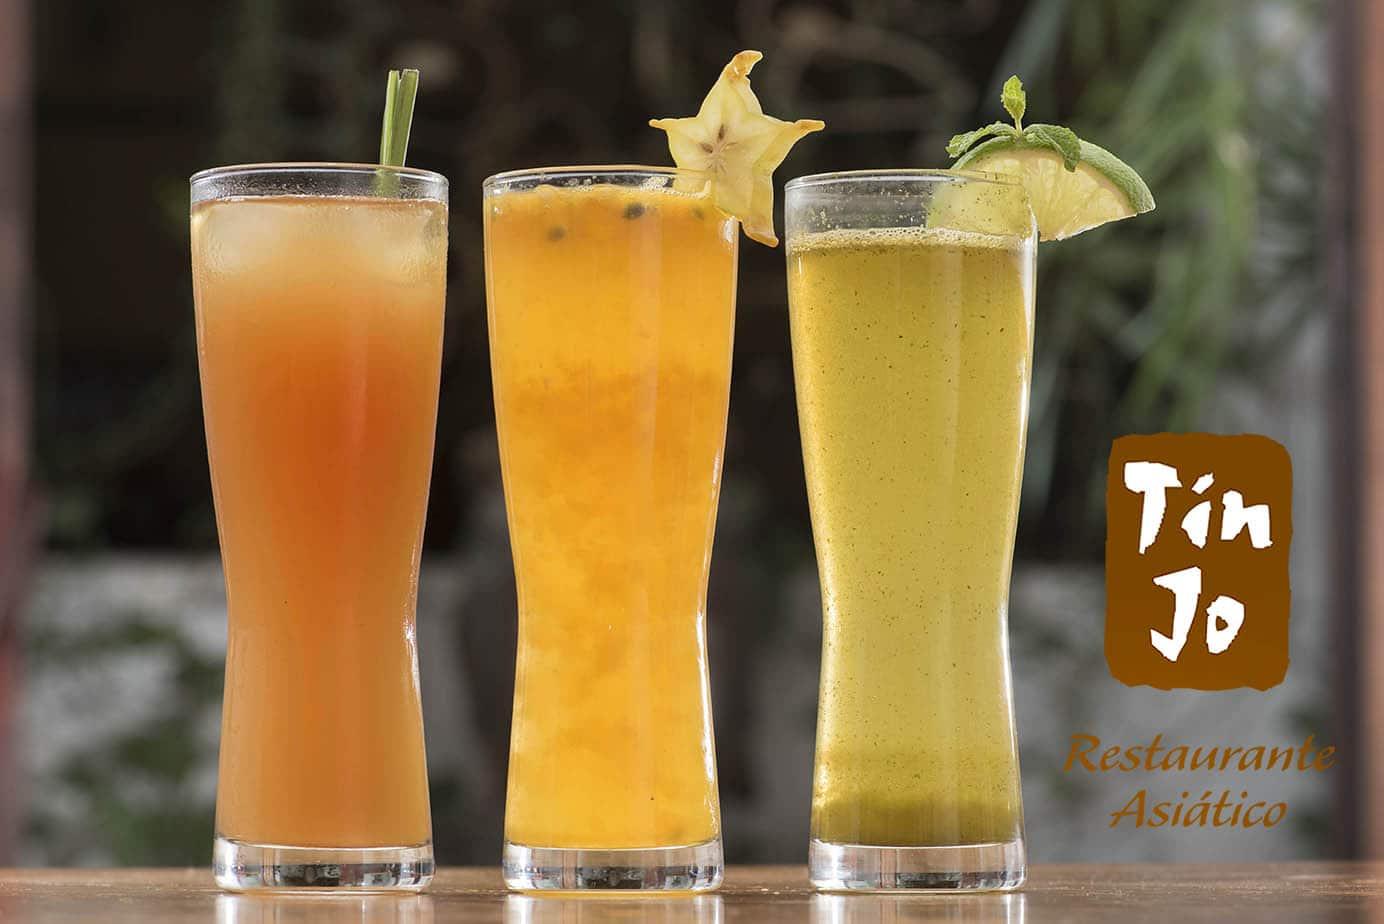 Restaurant Tin Jo Costa Rica Welcome To Your Restaurant Tin Jo # Muebles Urgelles